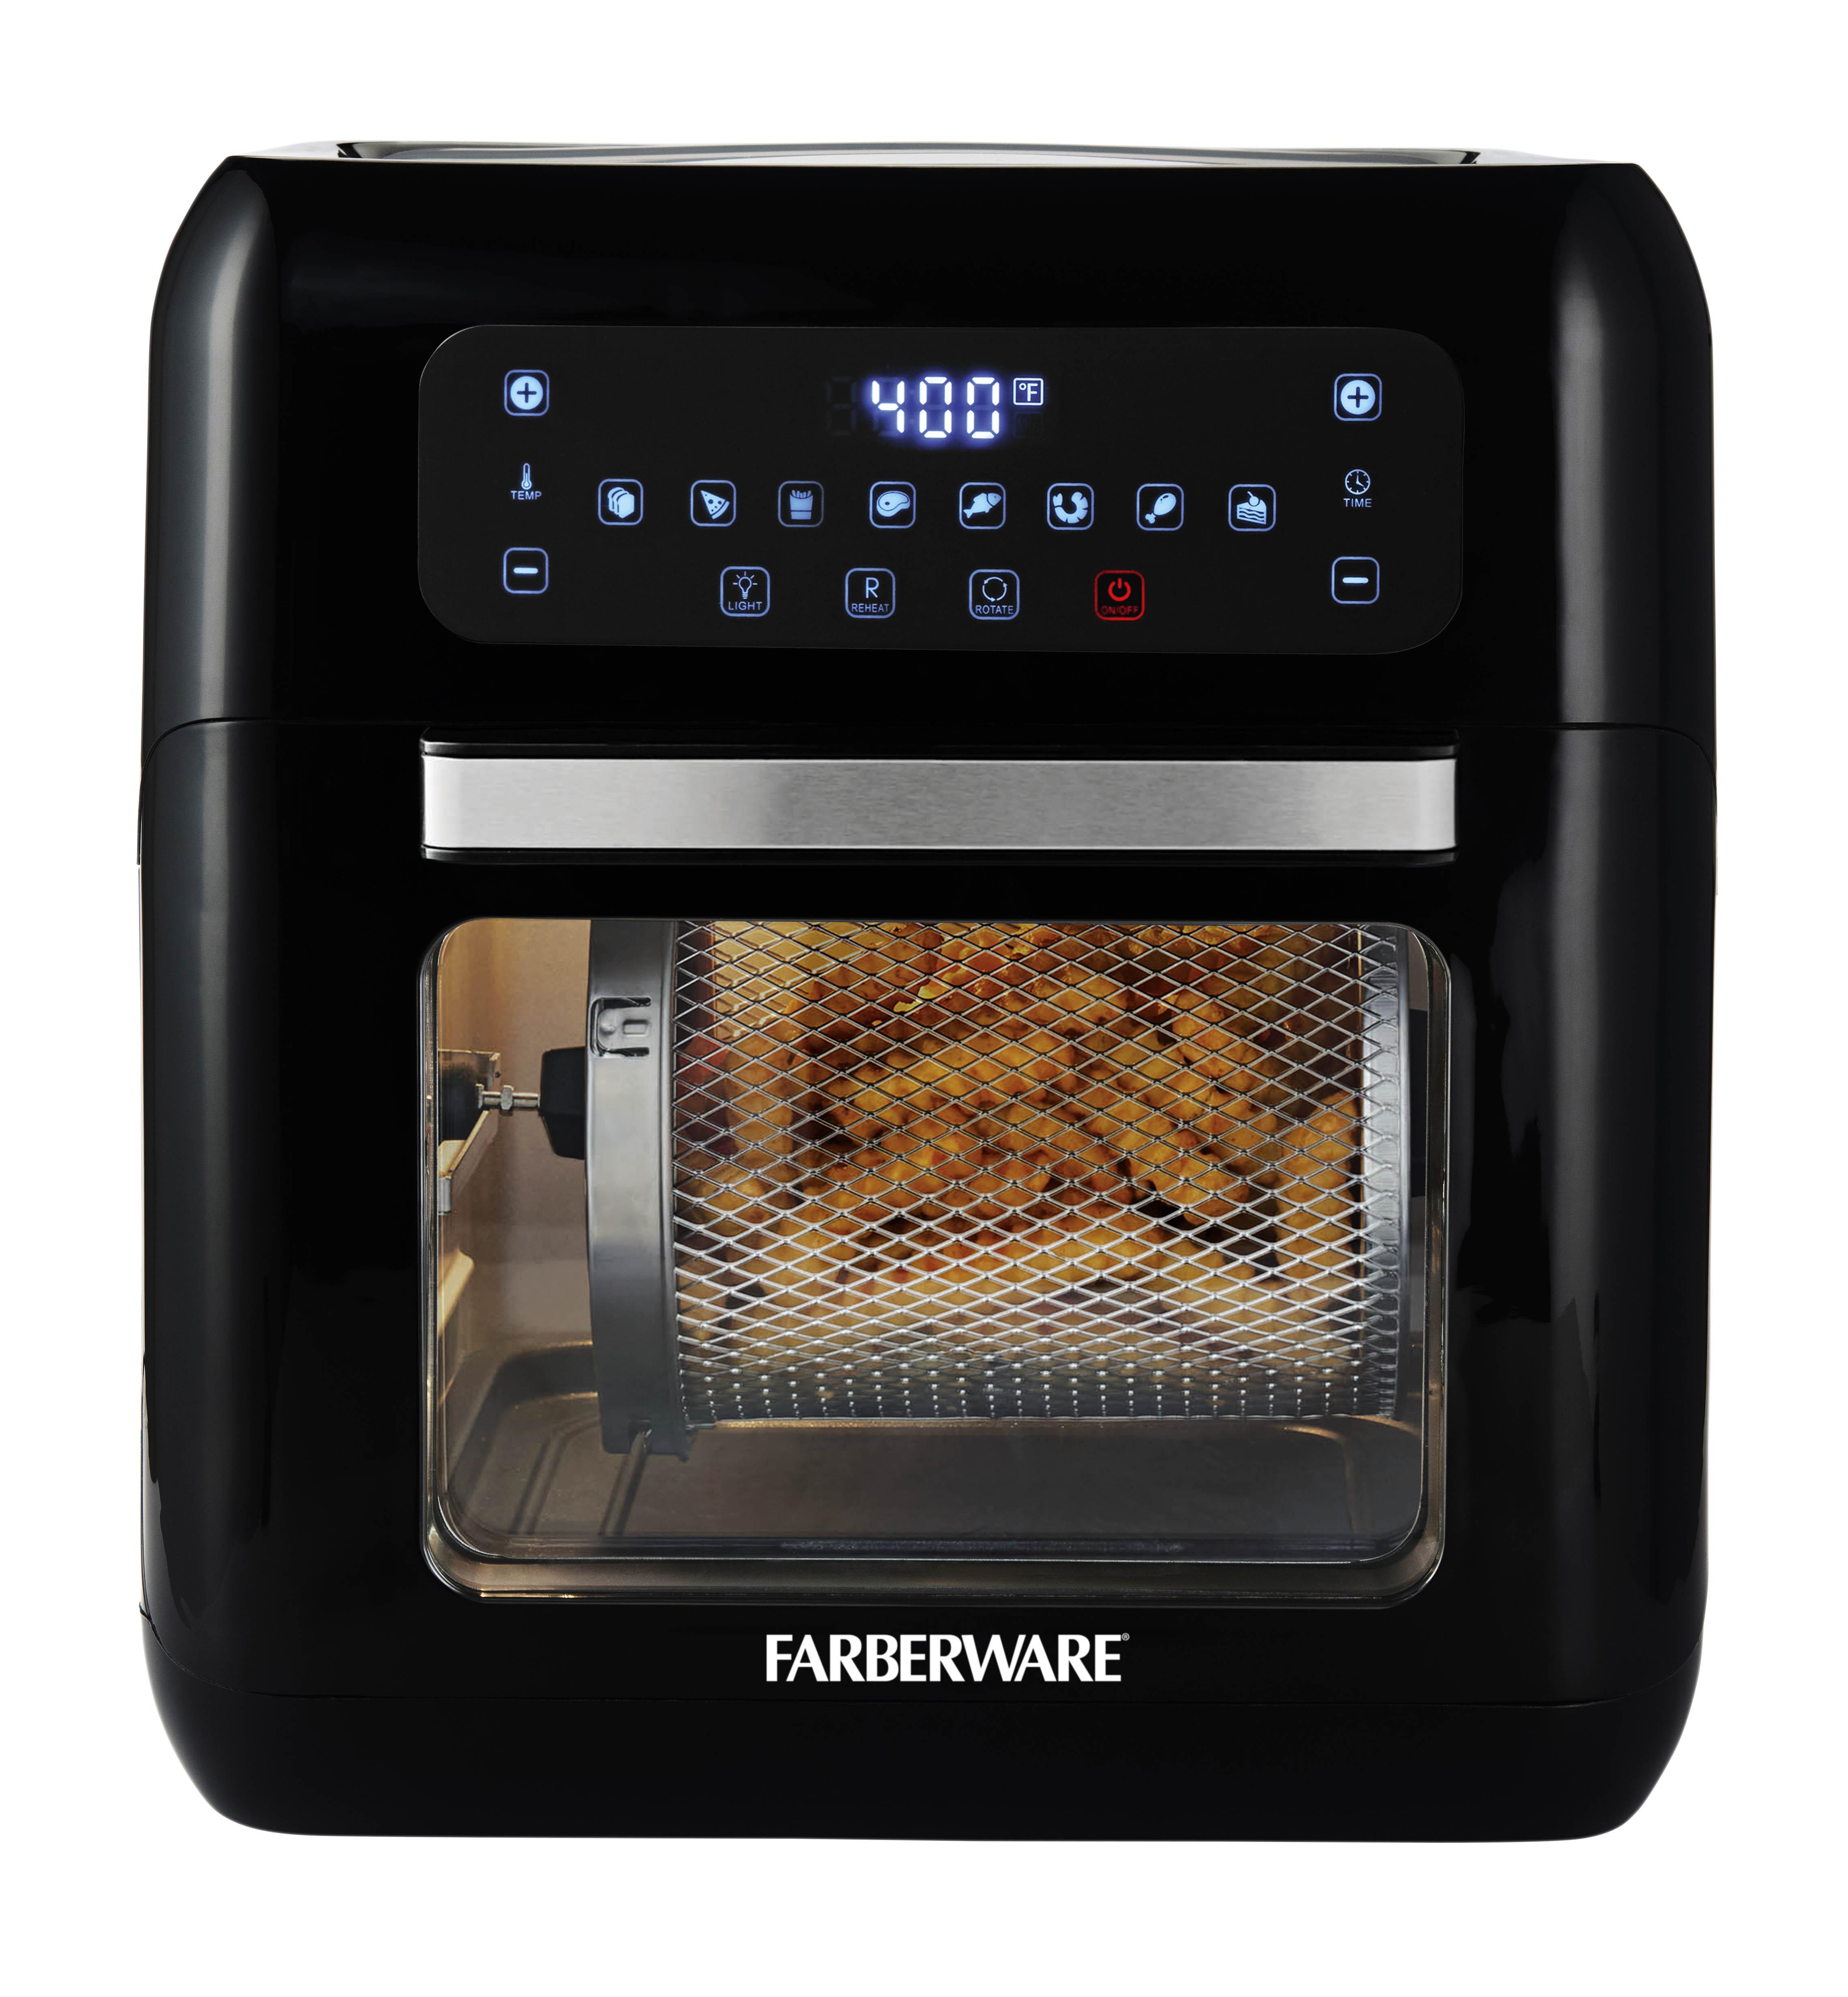 Farberware 6 Qt Air Fryer Oven - Buysmartt